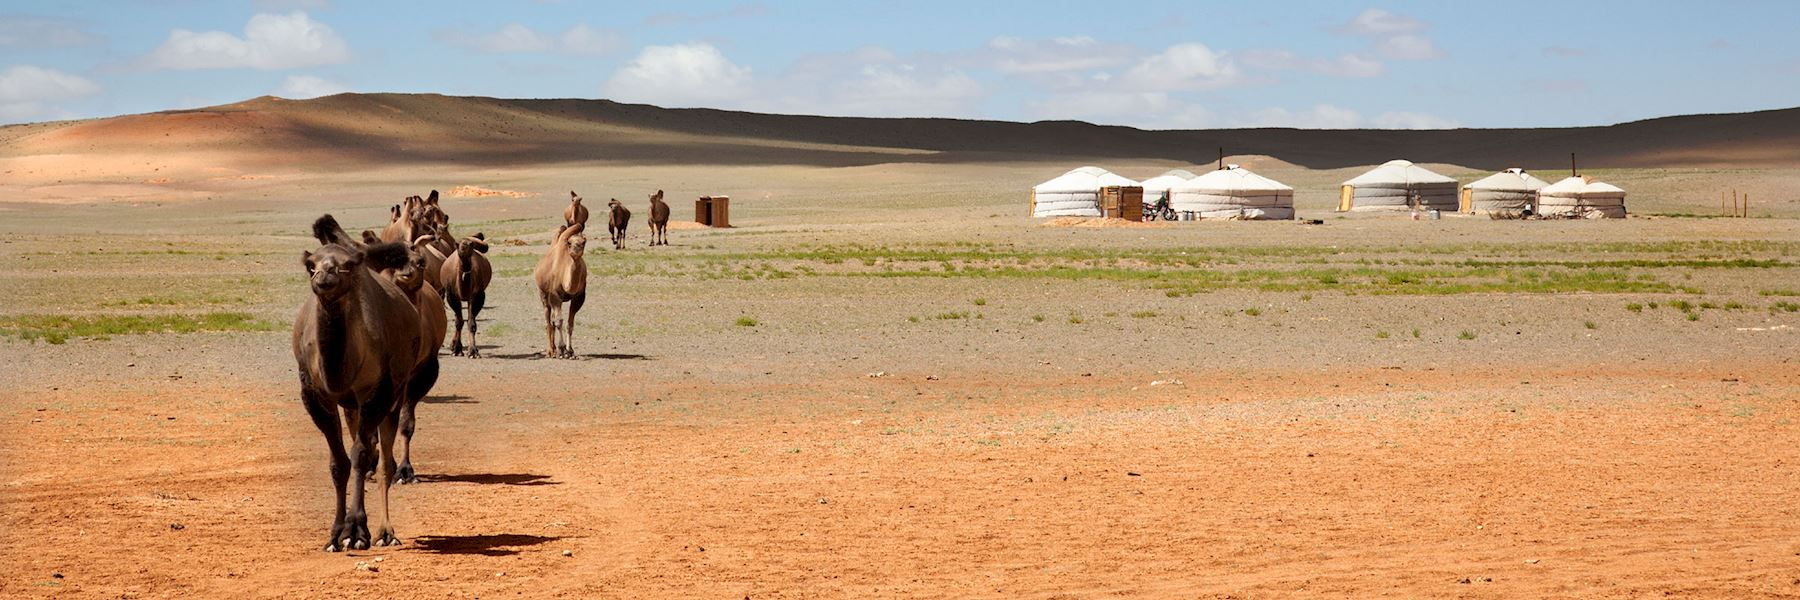 Mongolia holidays  2019 & 2020